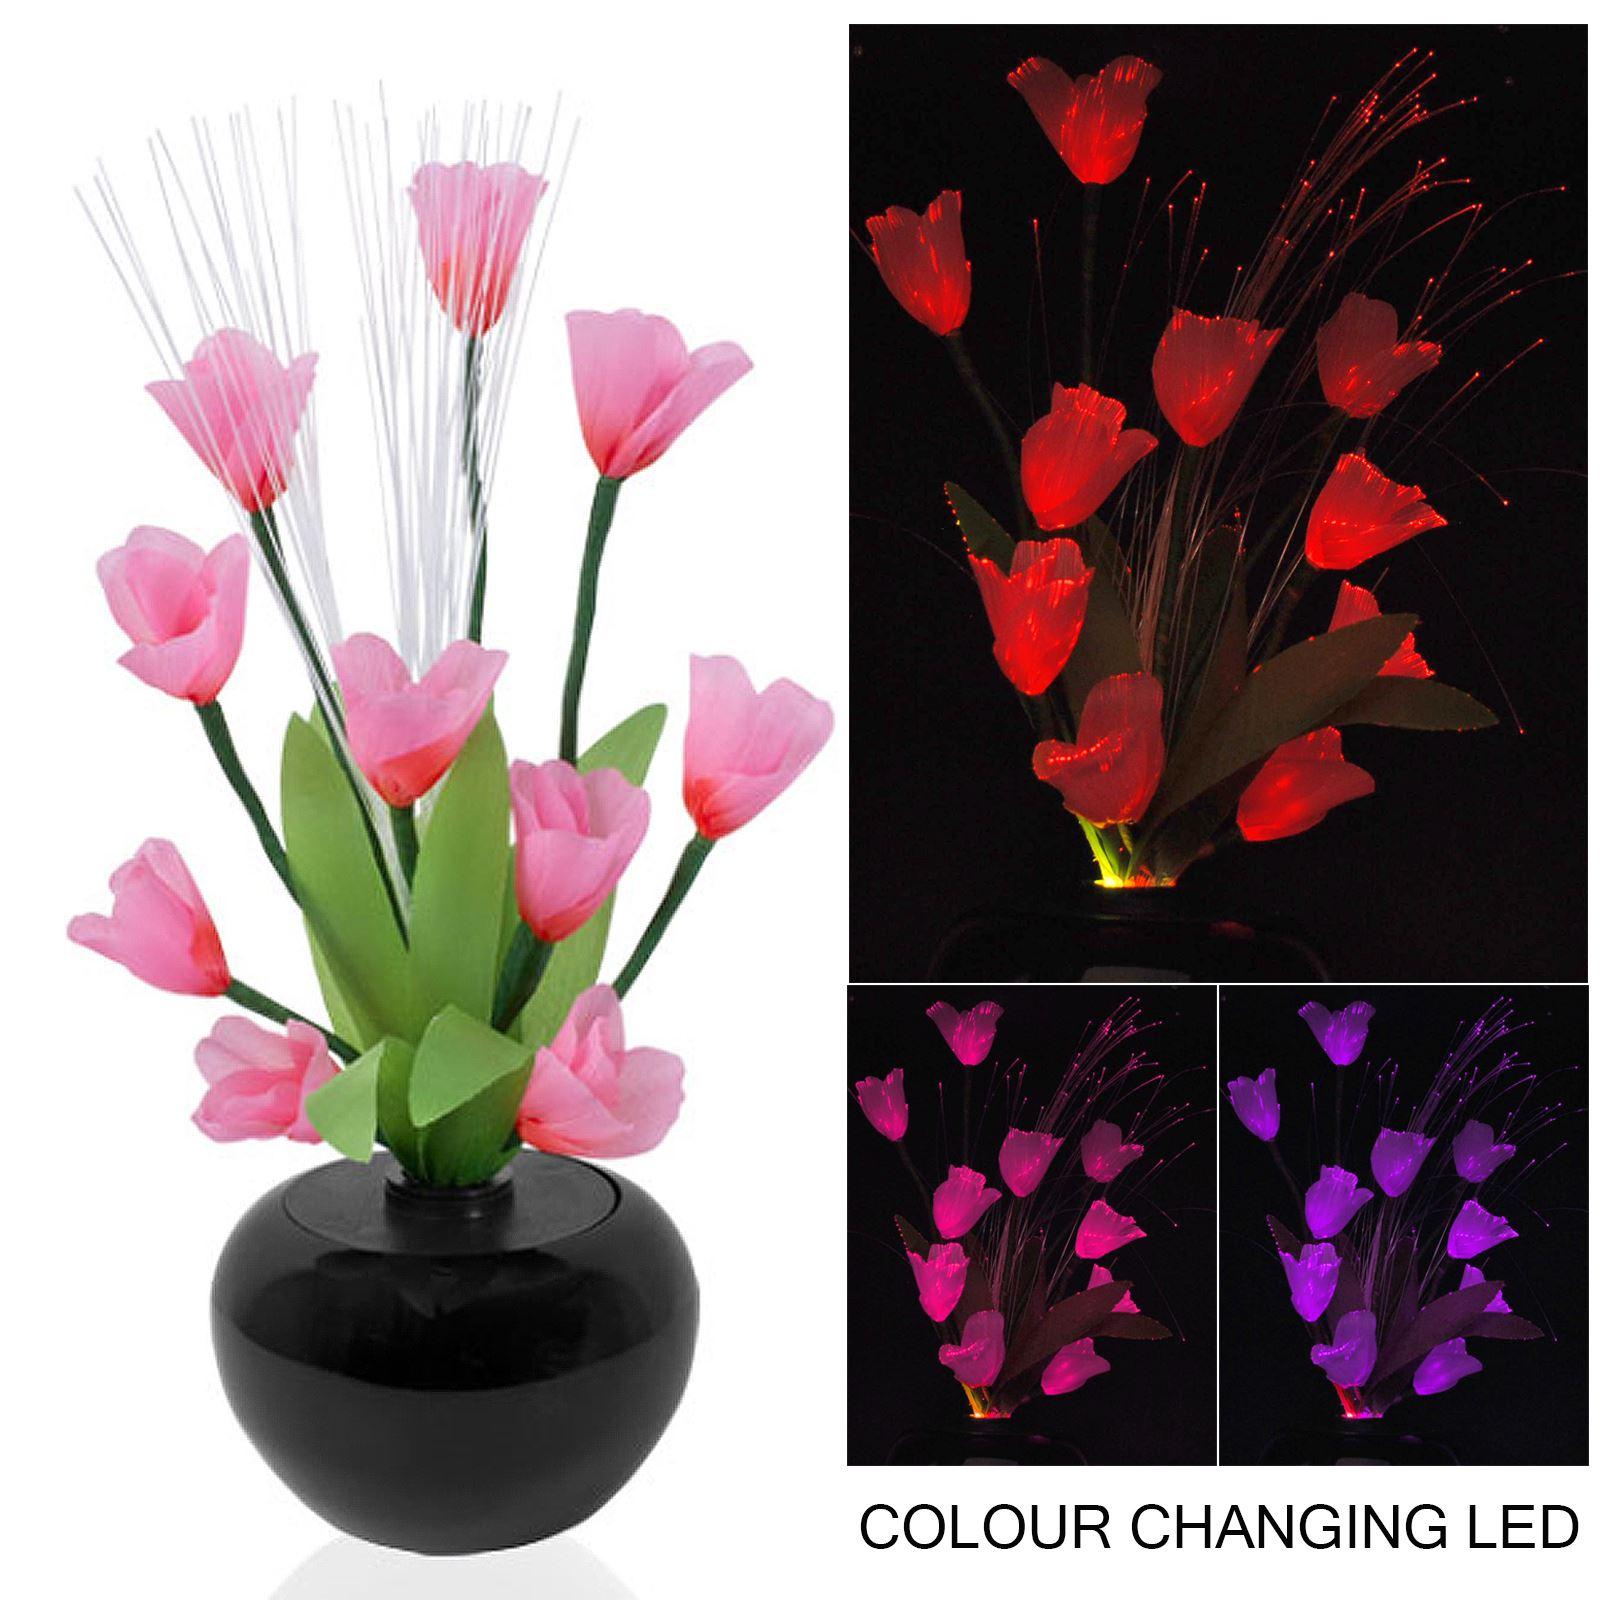 RGB Colour Changing Flower Vase Mood Light Display